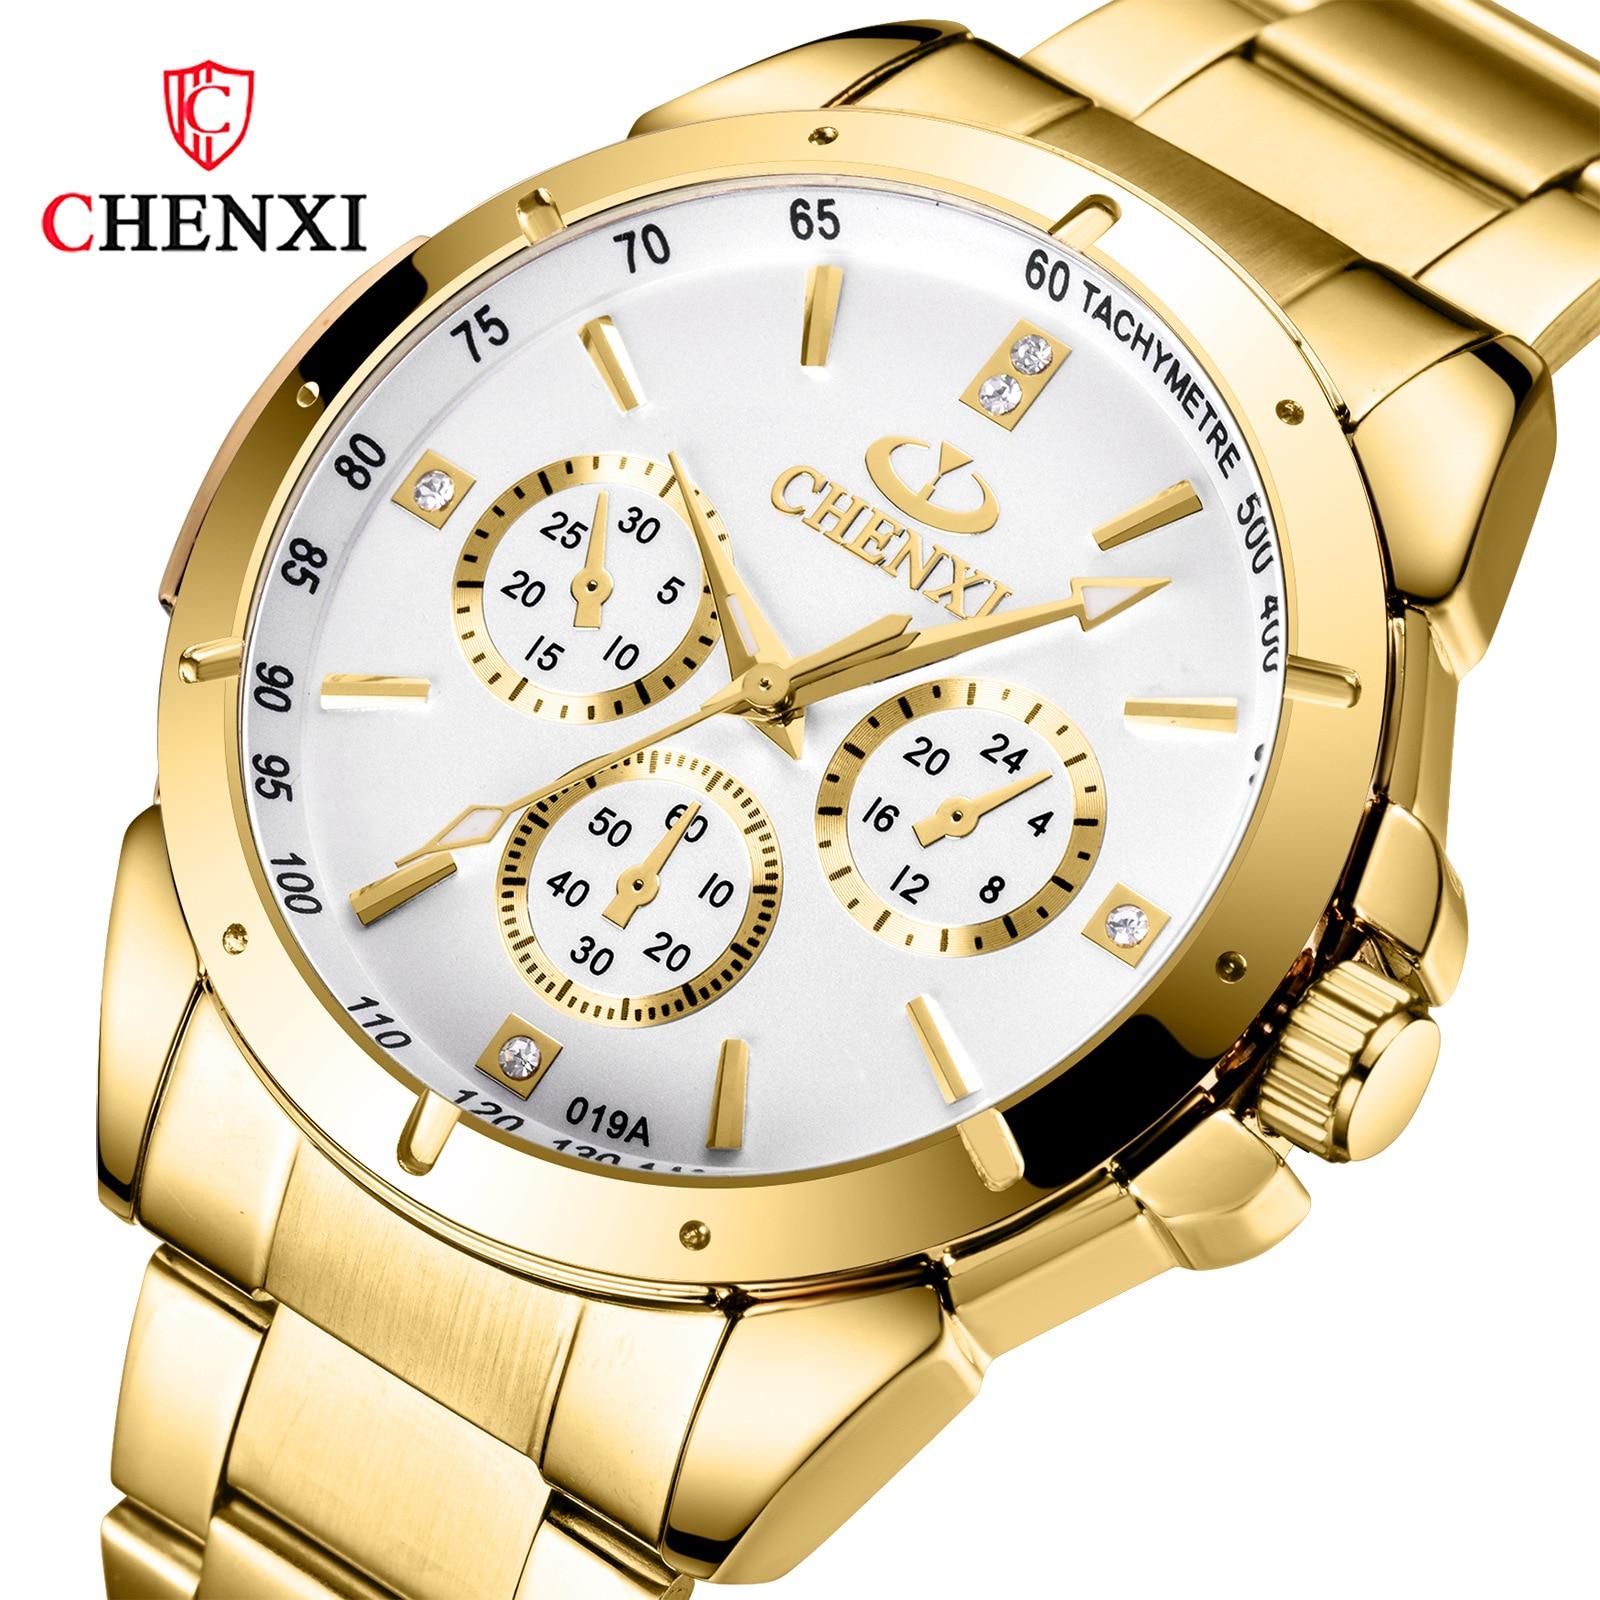 2019 CHENXI Top Brand Men Women Luxury Golden Quartz Couple Wristwatch Waterproof Full Stainless Steel Clock Mens Ladies Watches